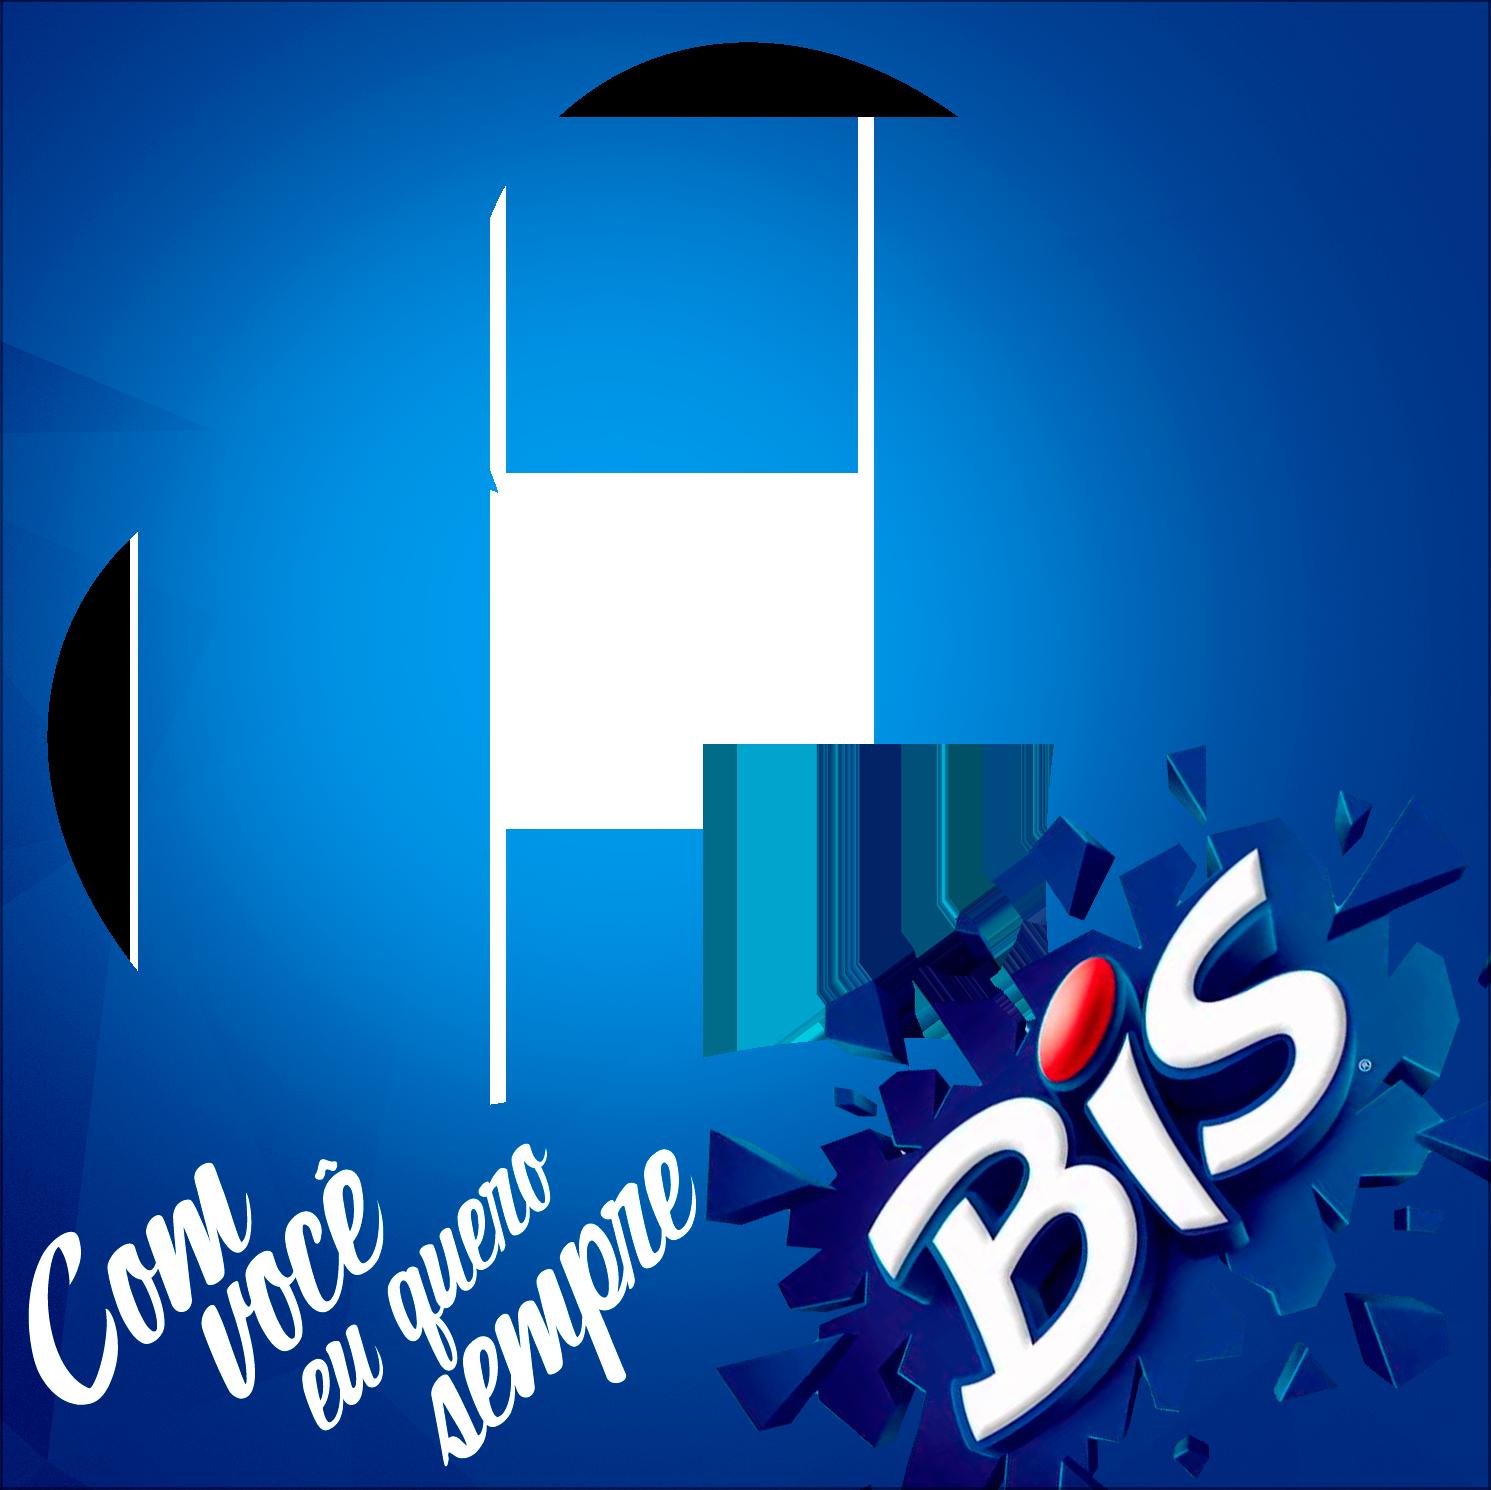 Adesivo para Caixa de Bombom Dia dos Namorados Bis